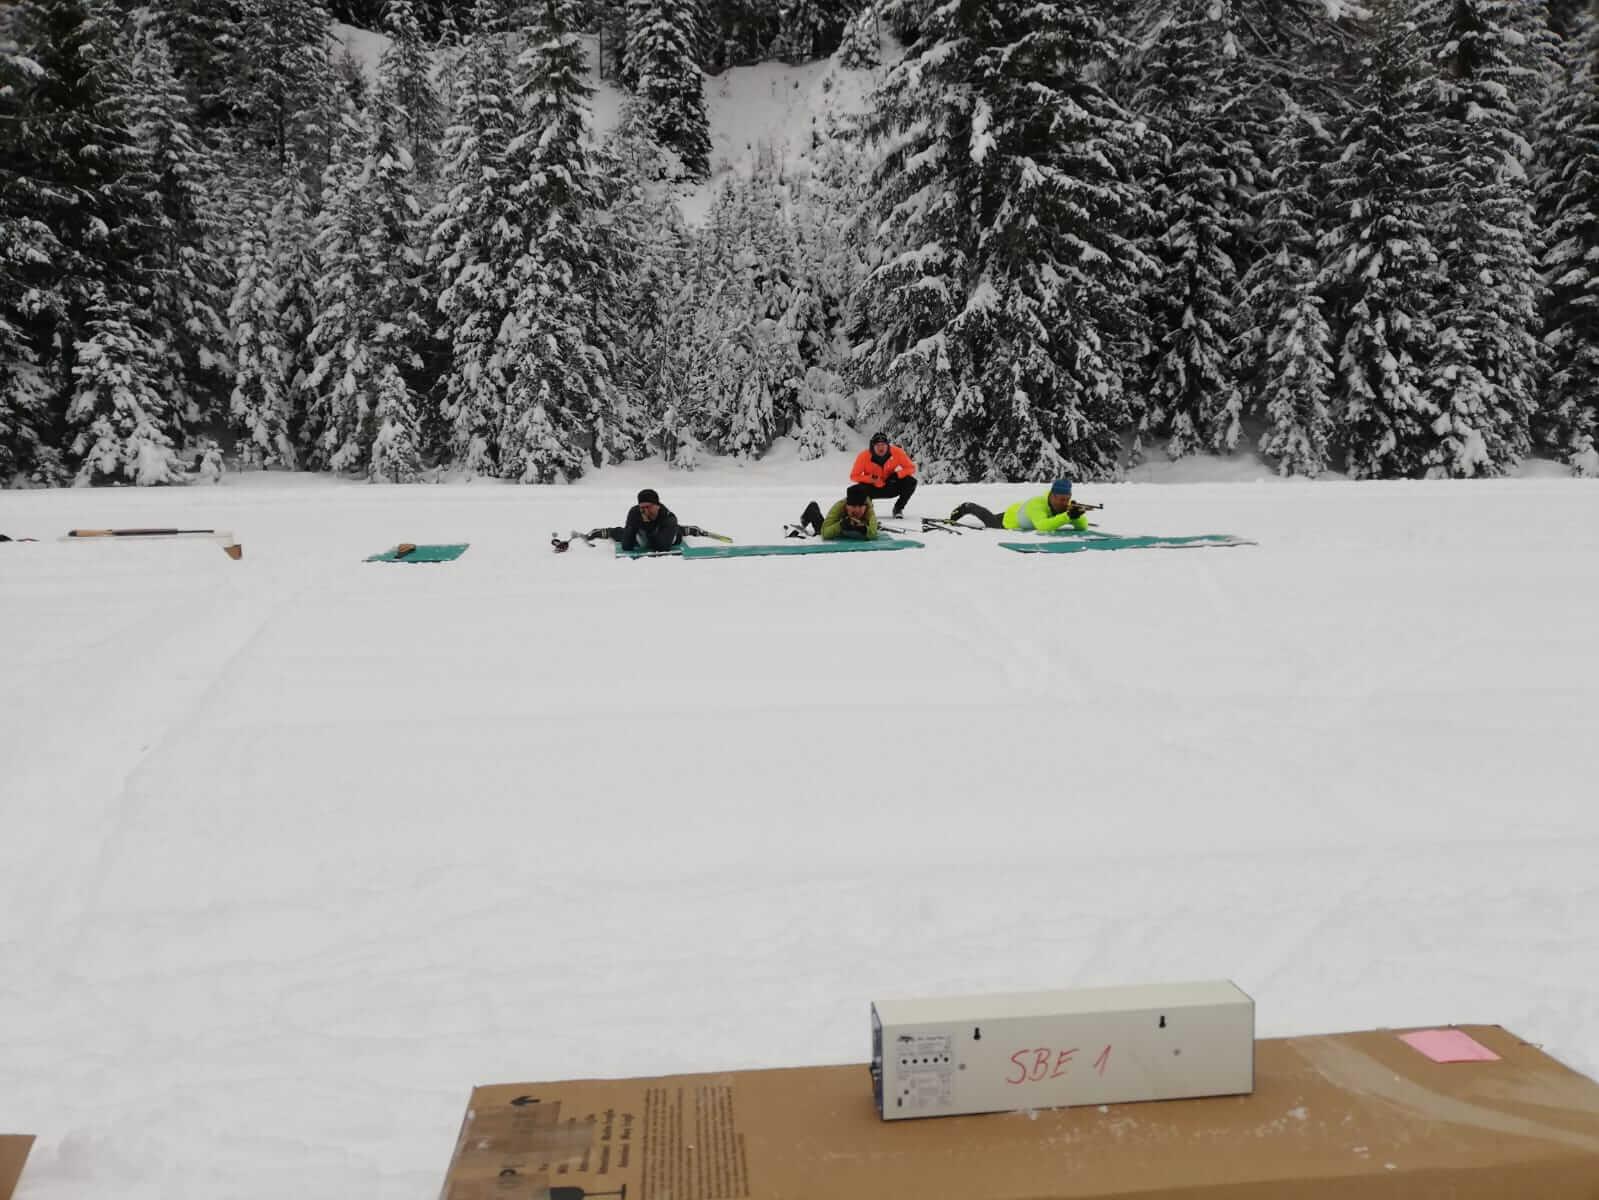 Langlauf Technik Trainingslager Biathlon Wettkampf